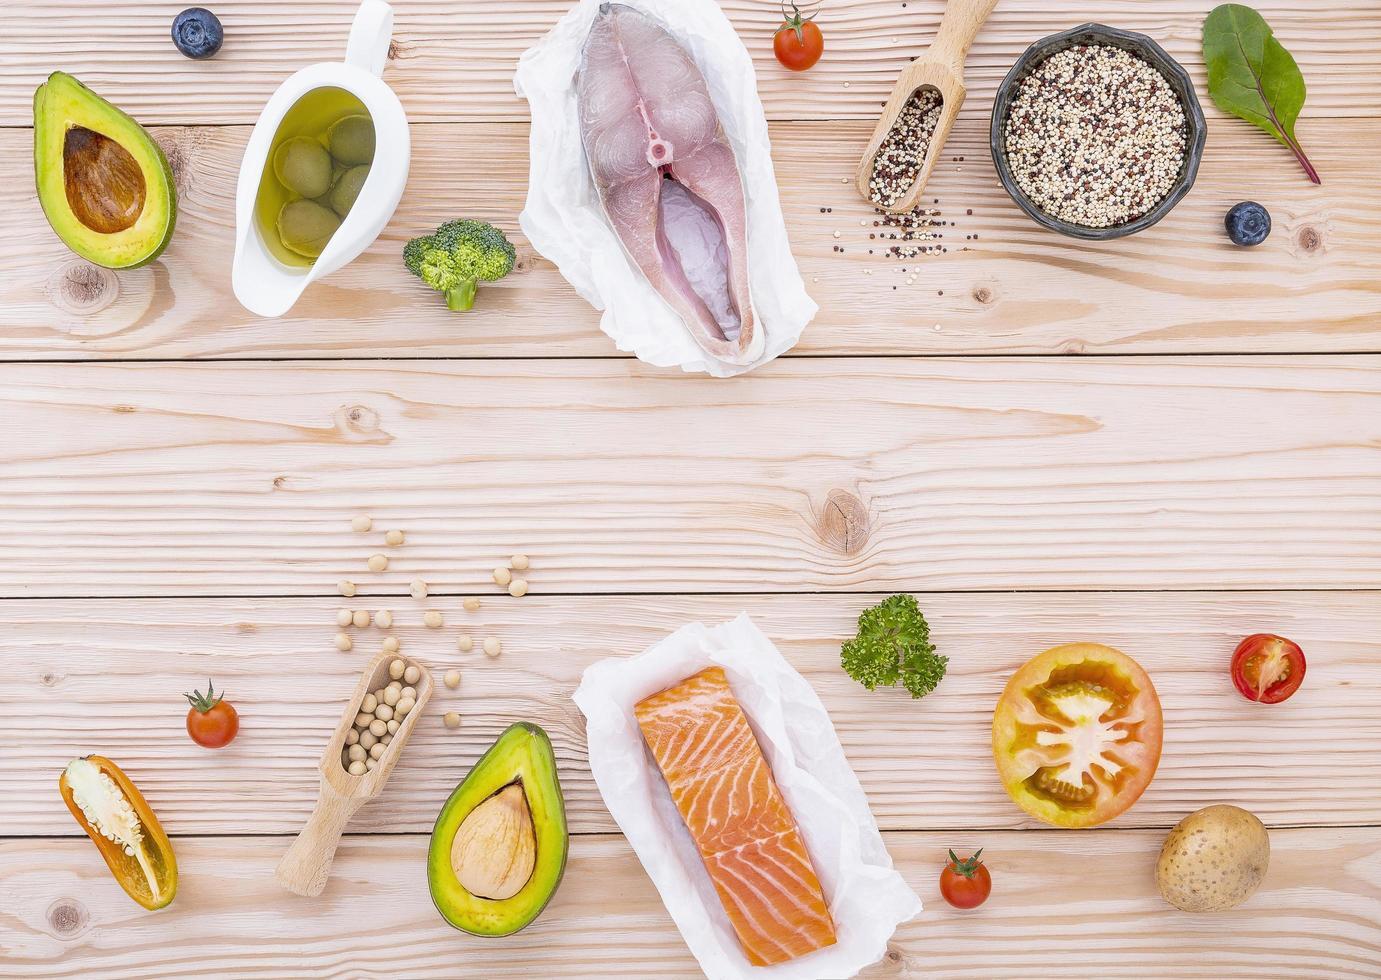 Border of raw ingredients photo